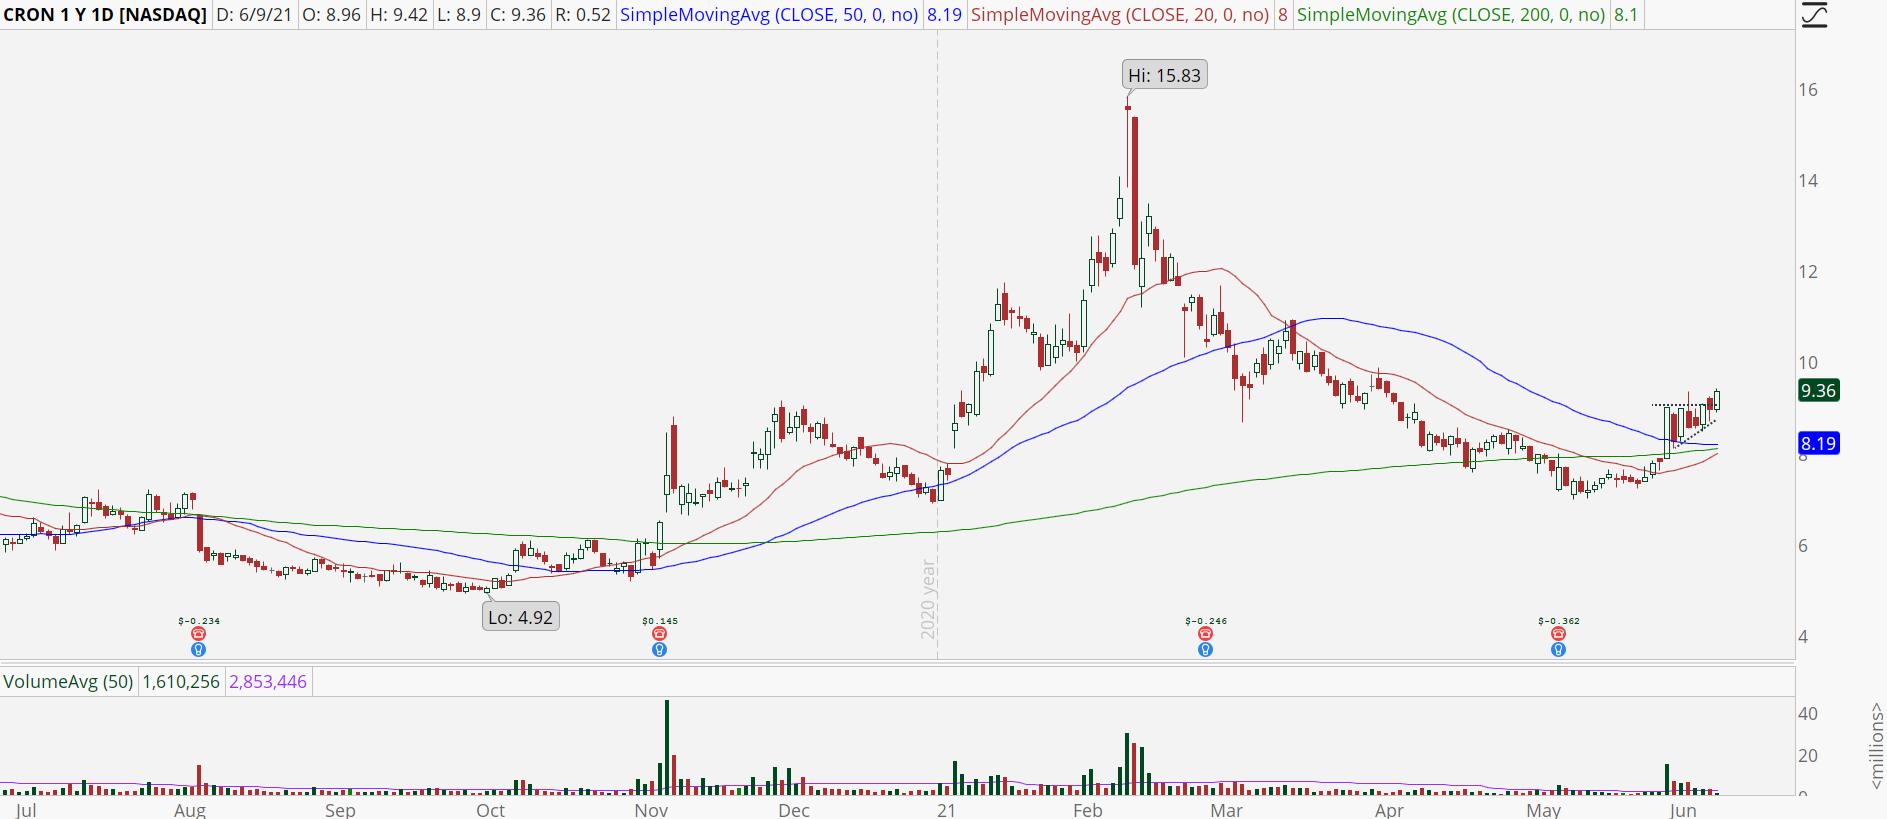 Cronos Group (CRON) stock chart with bullish breakout